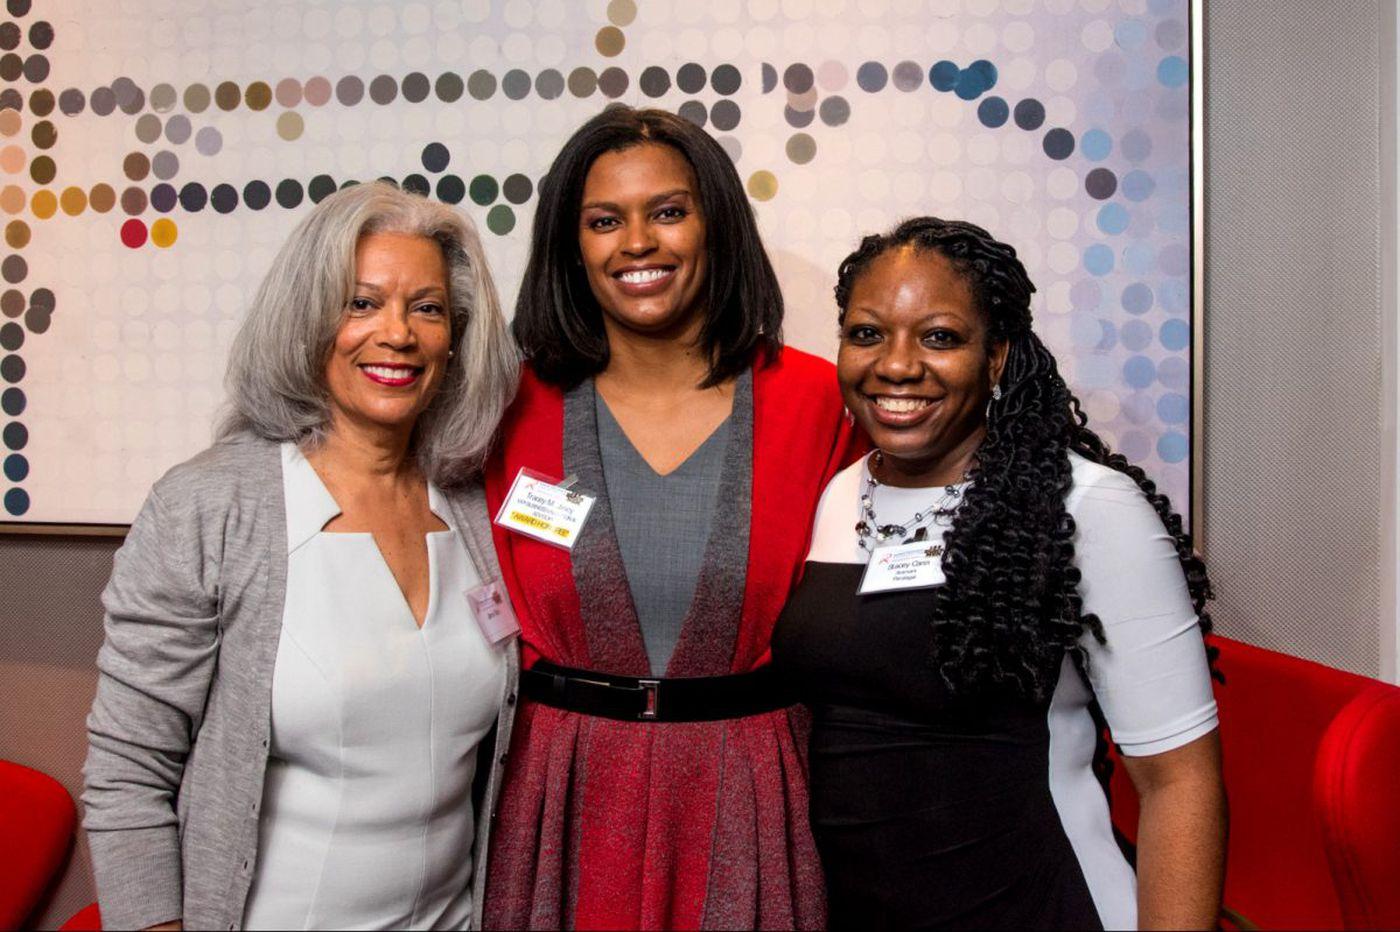 Business/mentoring groups WPO, 100 Black Men honor 10 Phila. Women of Color